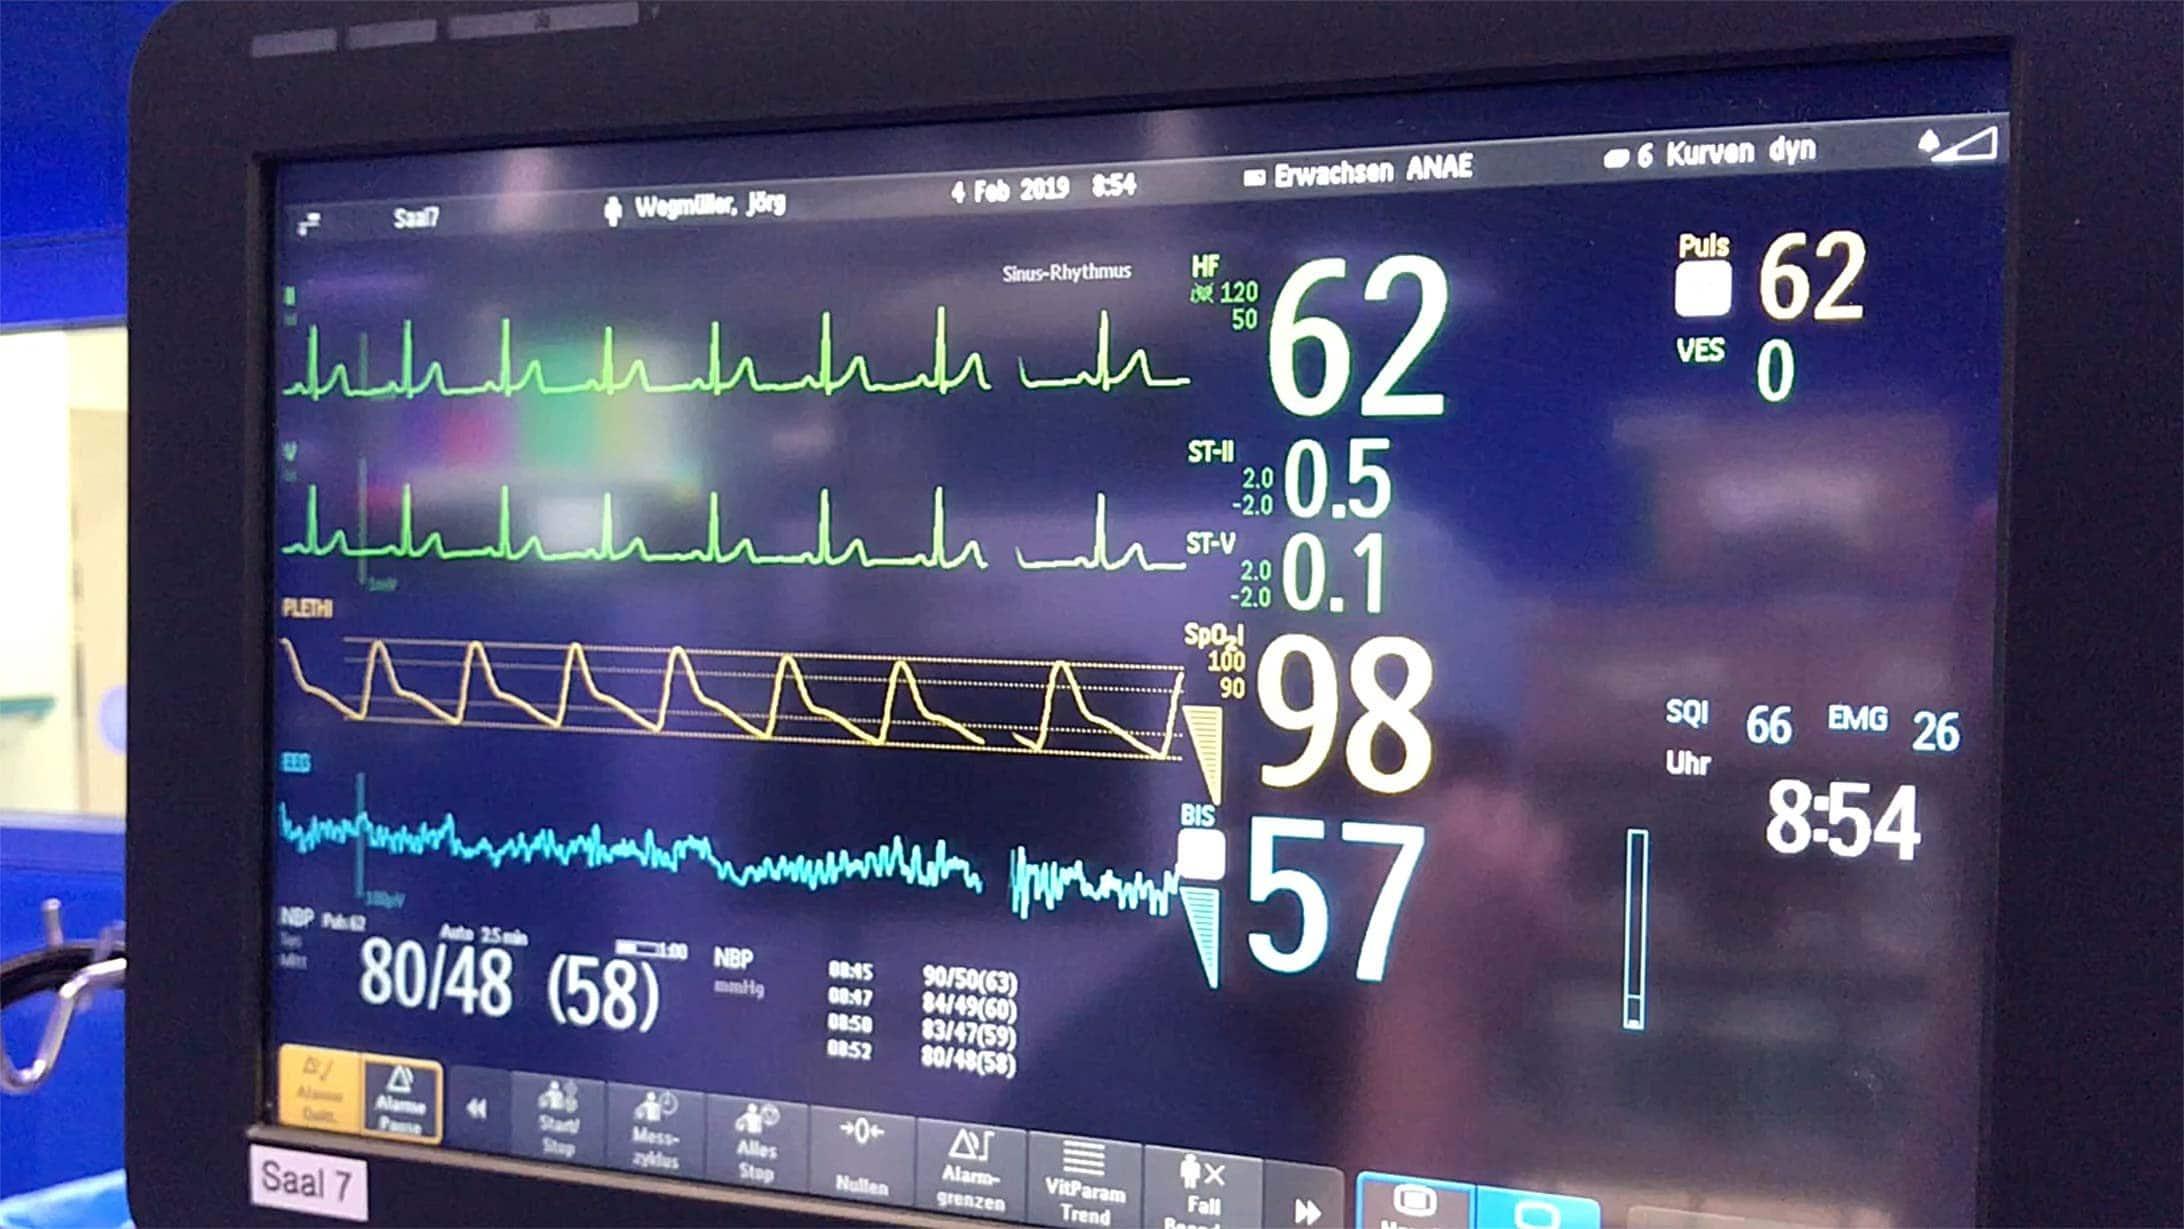 Hernien-OP: Bild eines Monitors